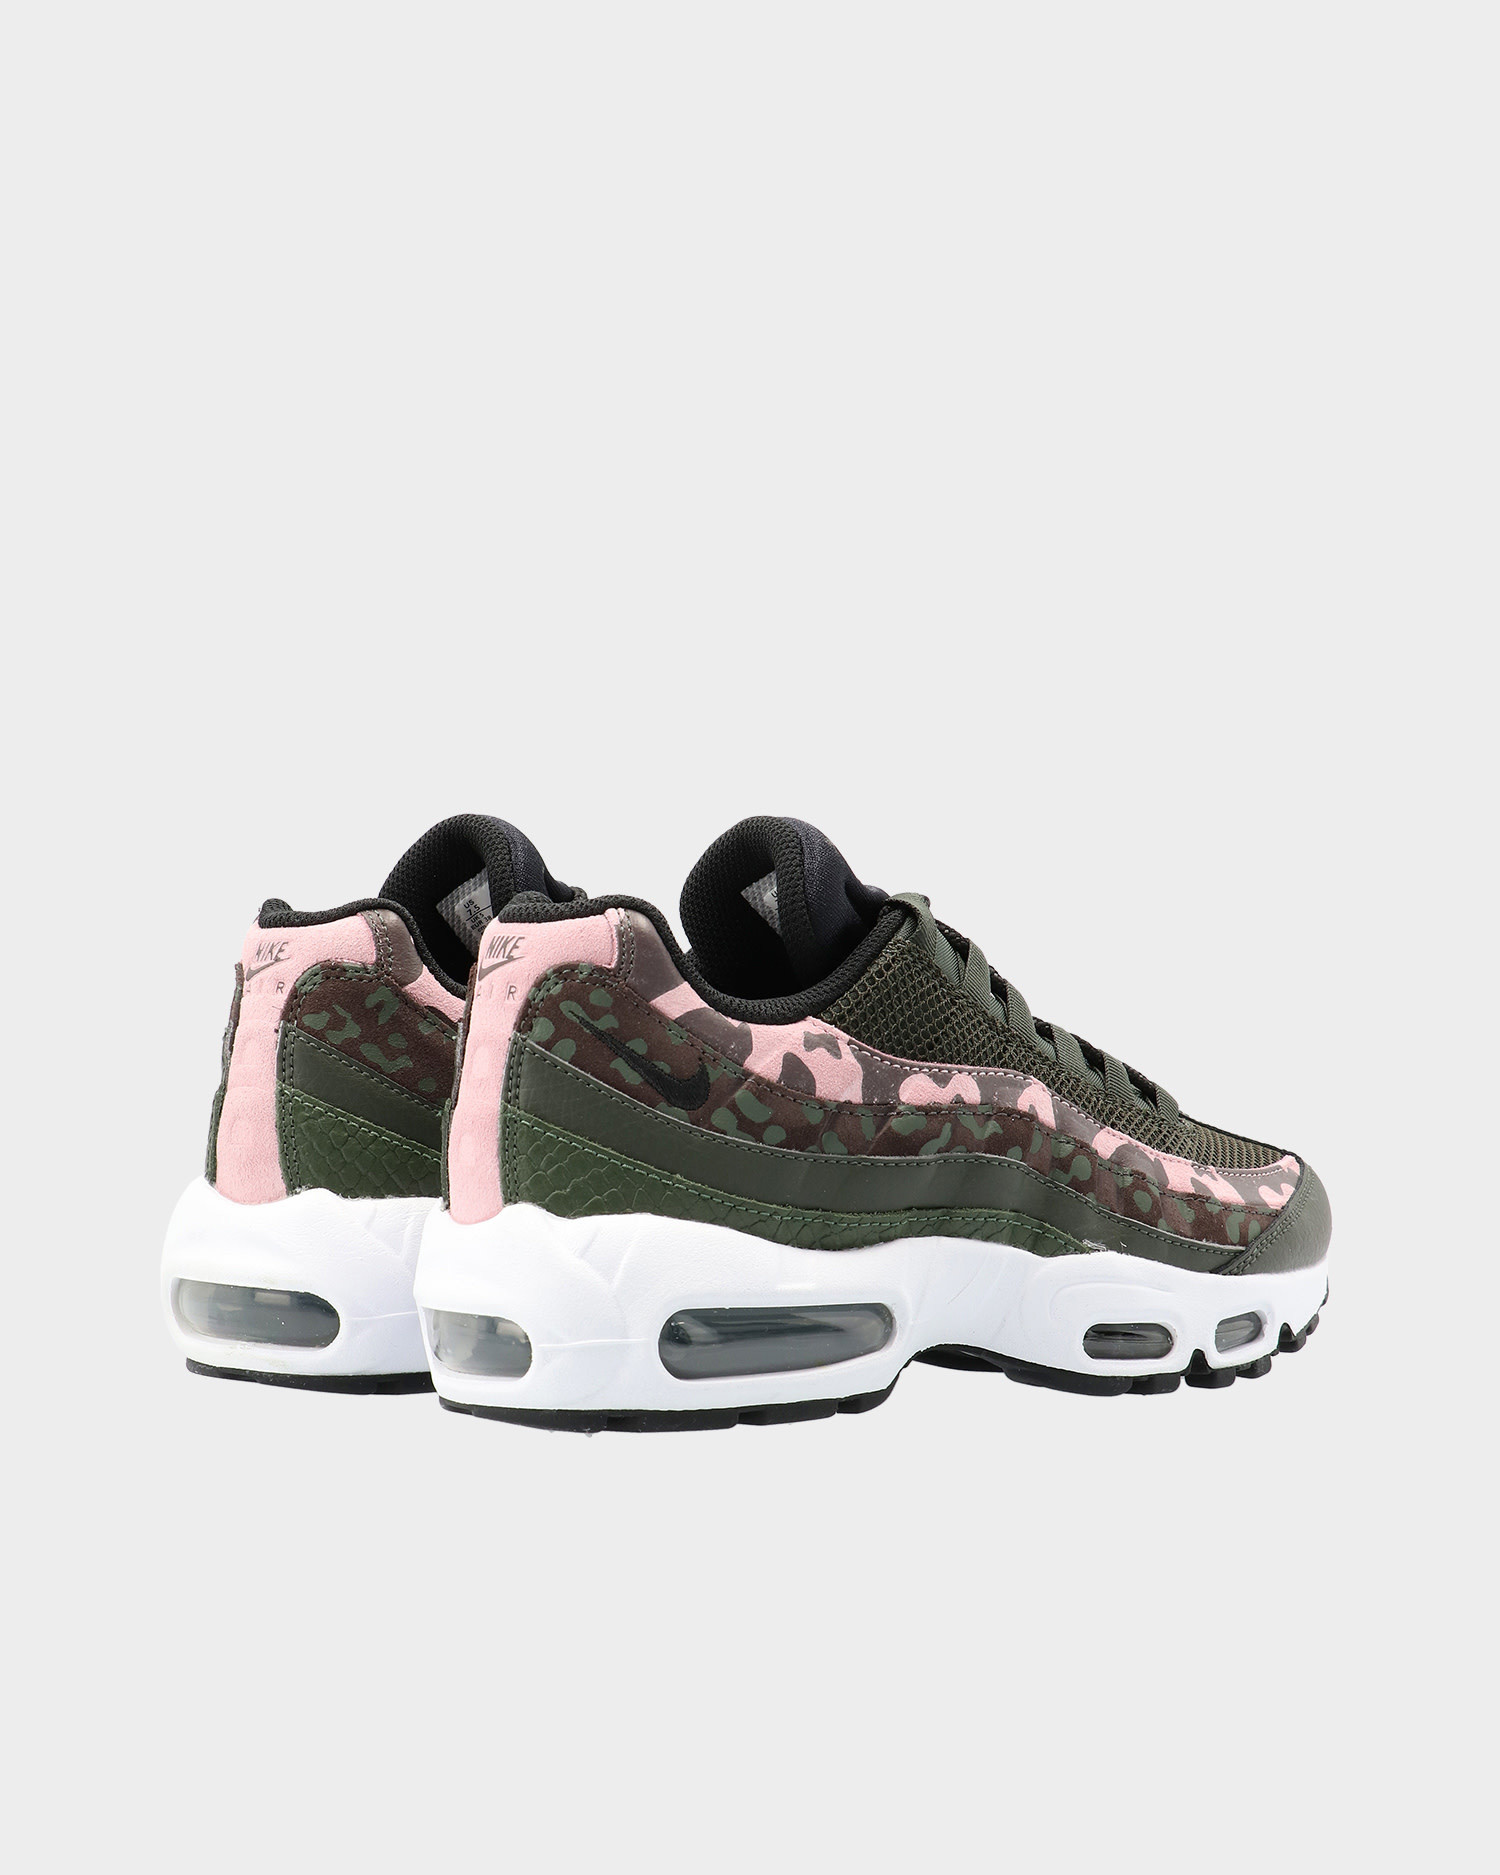 Nike Wmns Air Max 95 Brown Basalt/Black-Sequoia-Pink Glaze